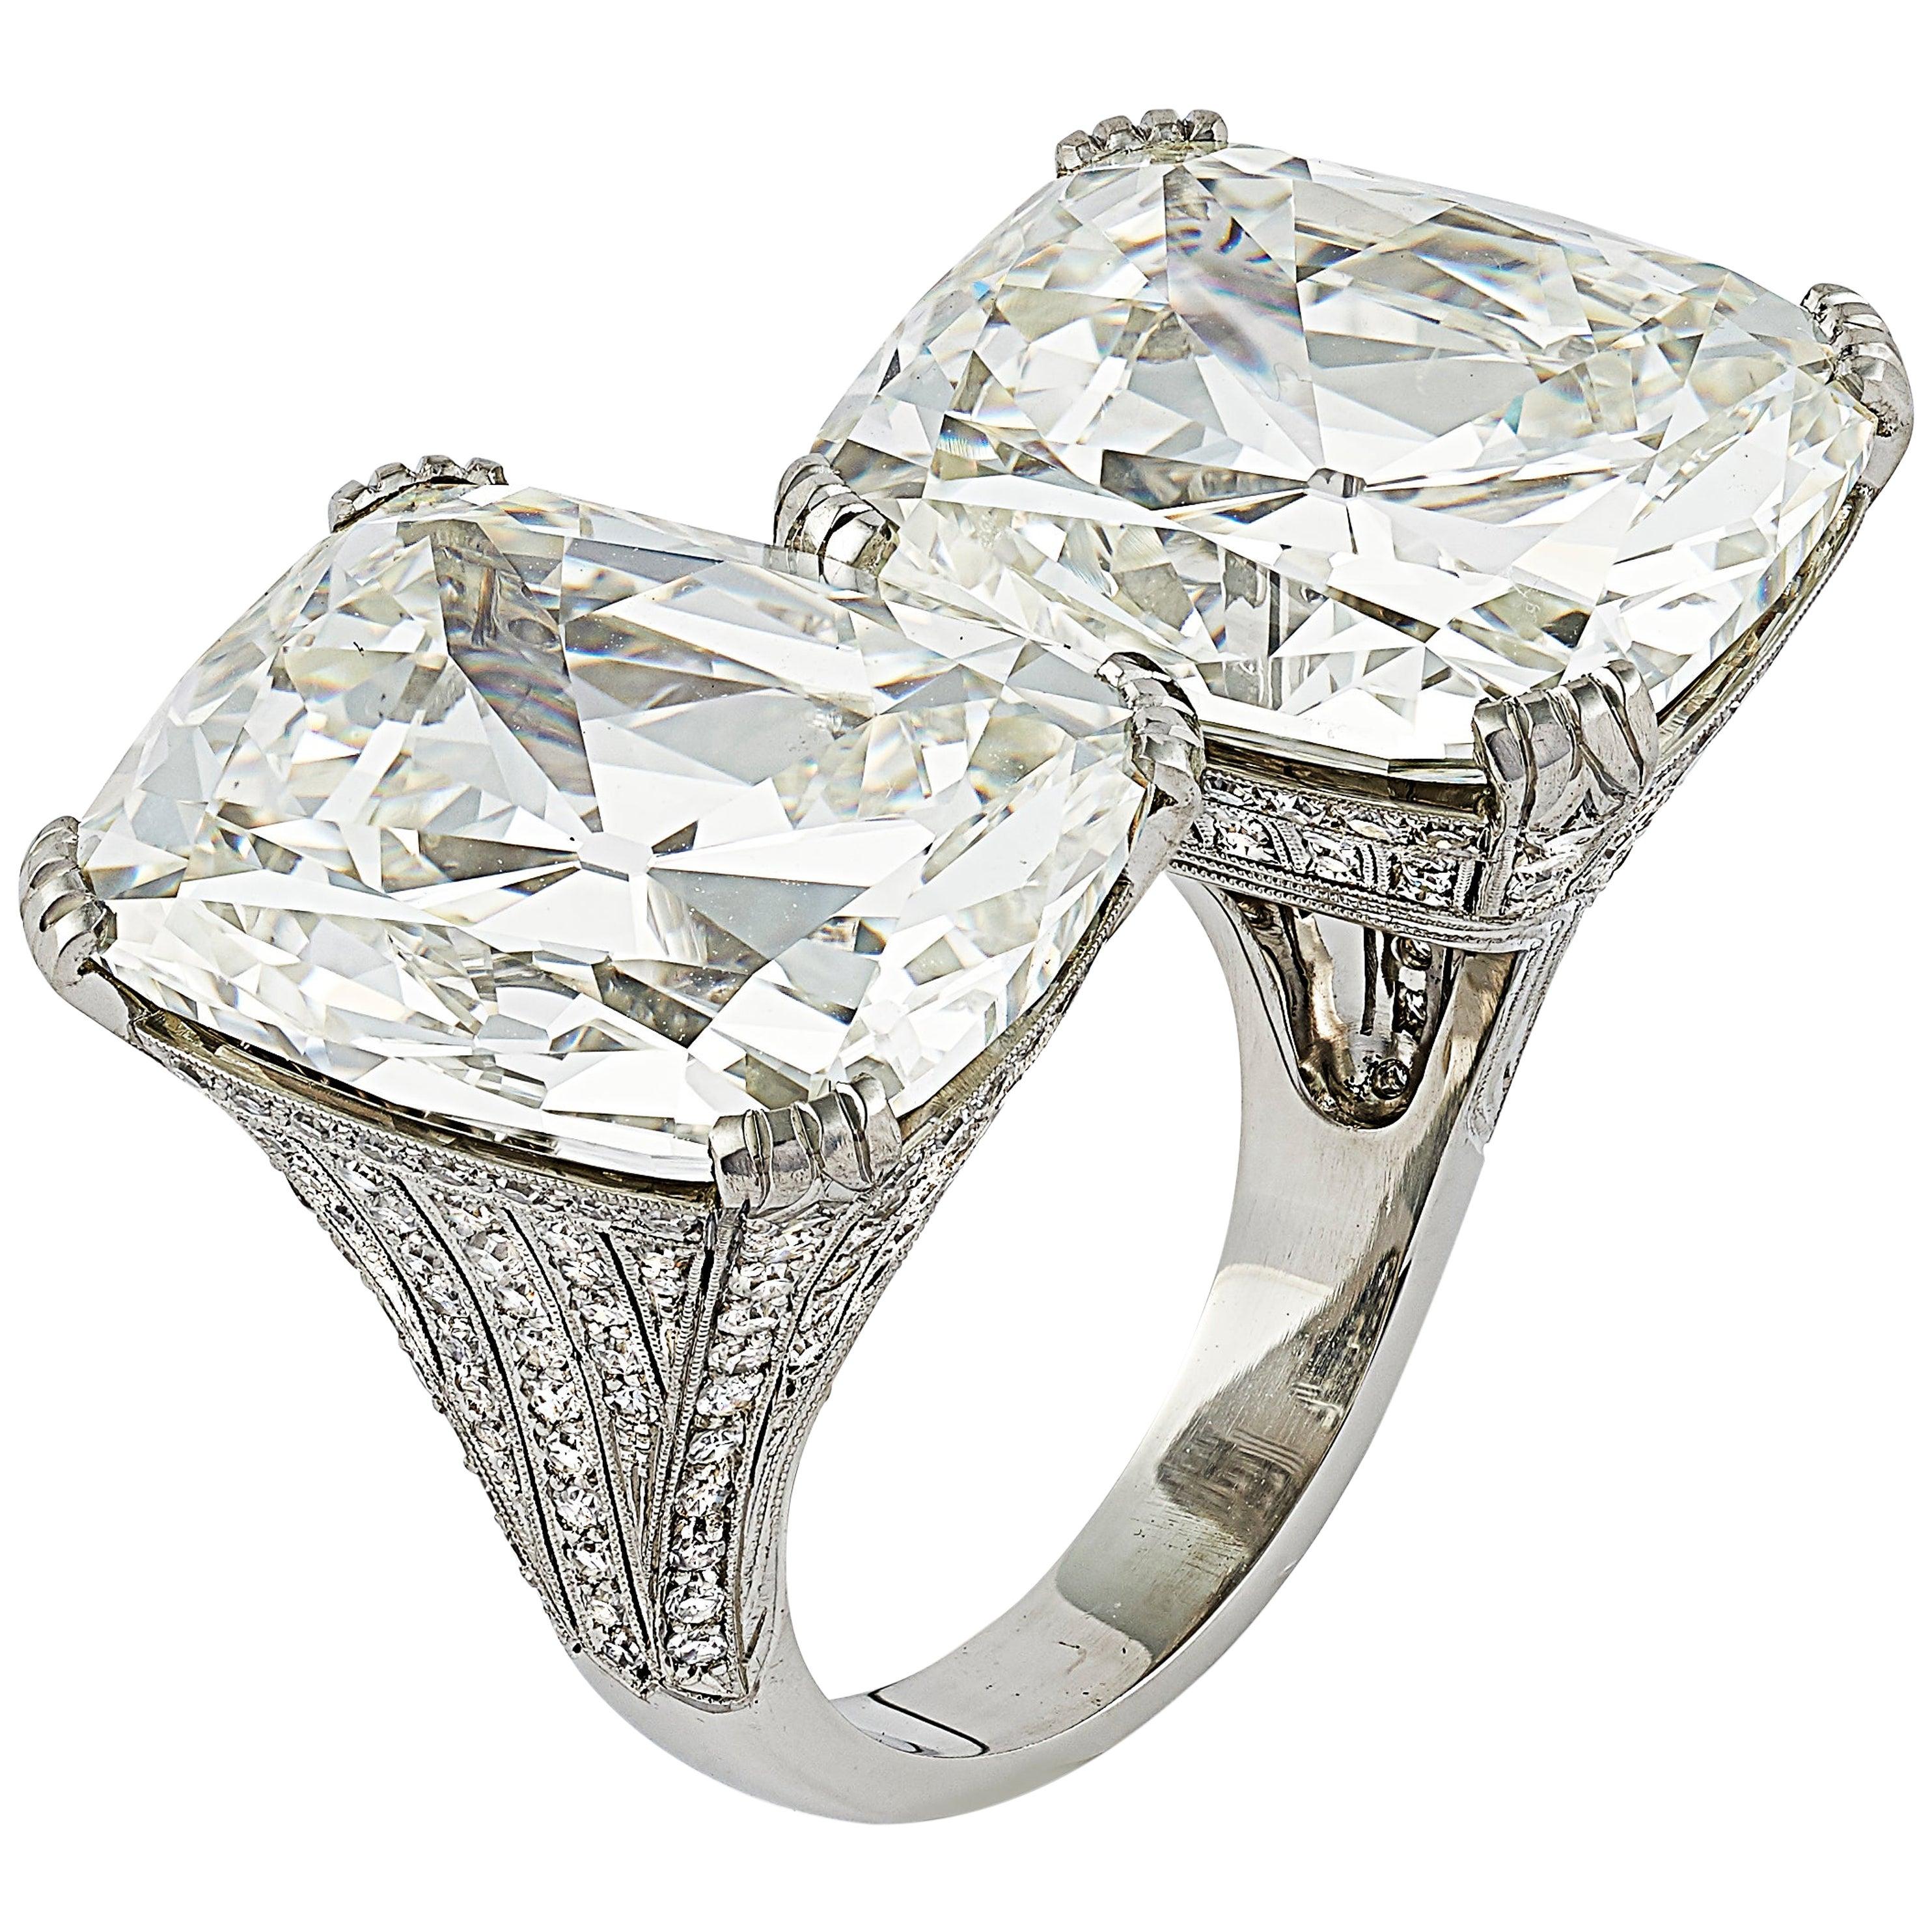 Extraordinary 41.78 Carat Cushion Cut Diamond Crossover Ring by Hancocks